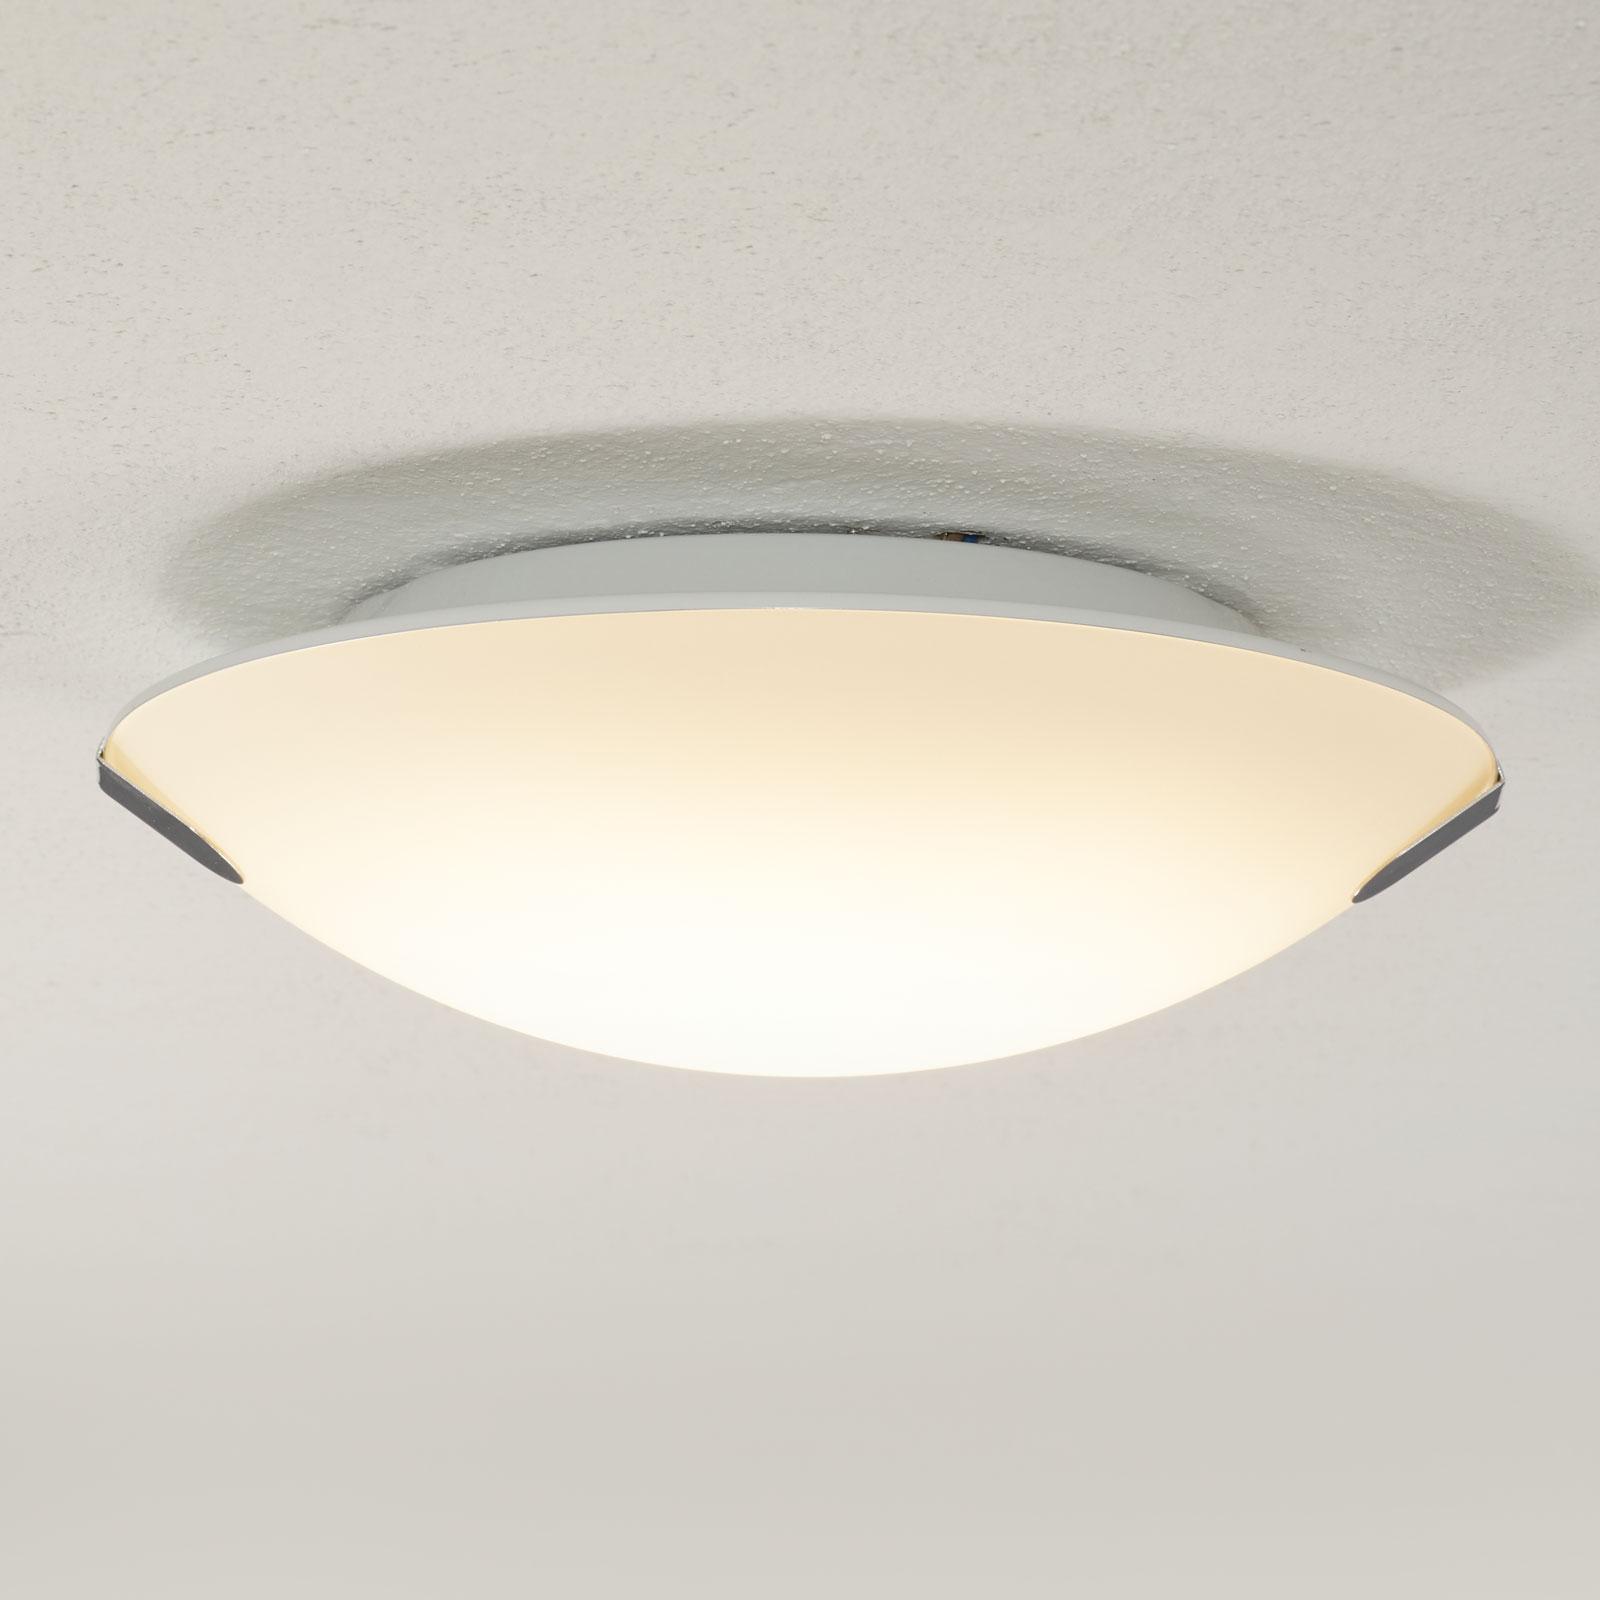 Acquista Arcchio Telie plafoniera LED